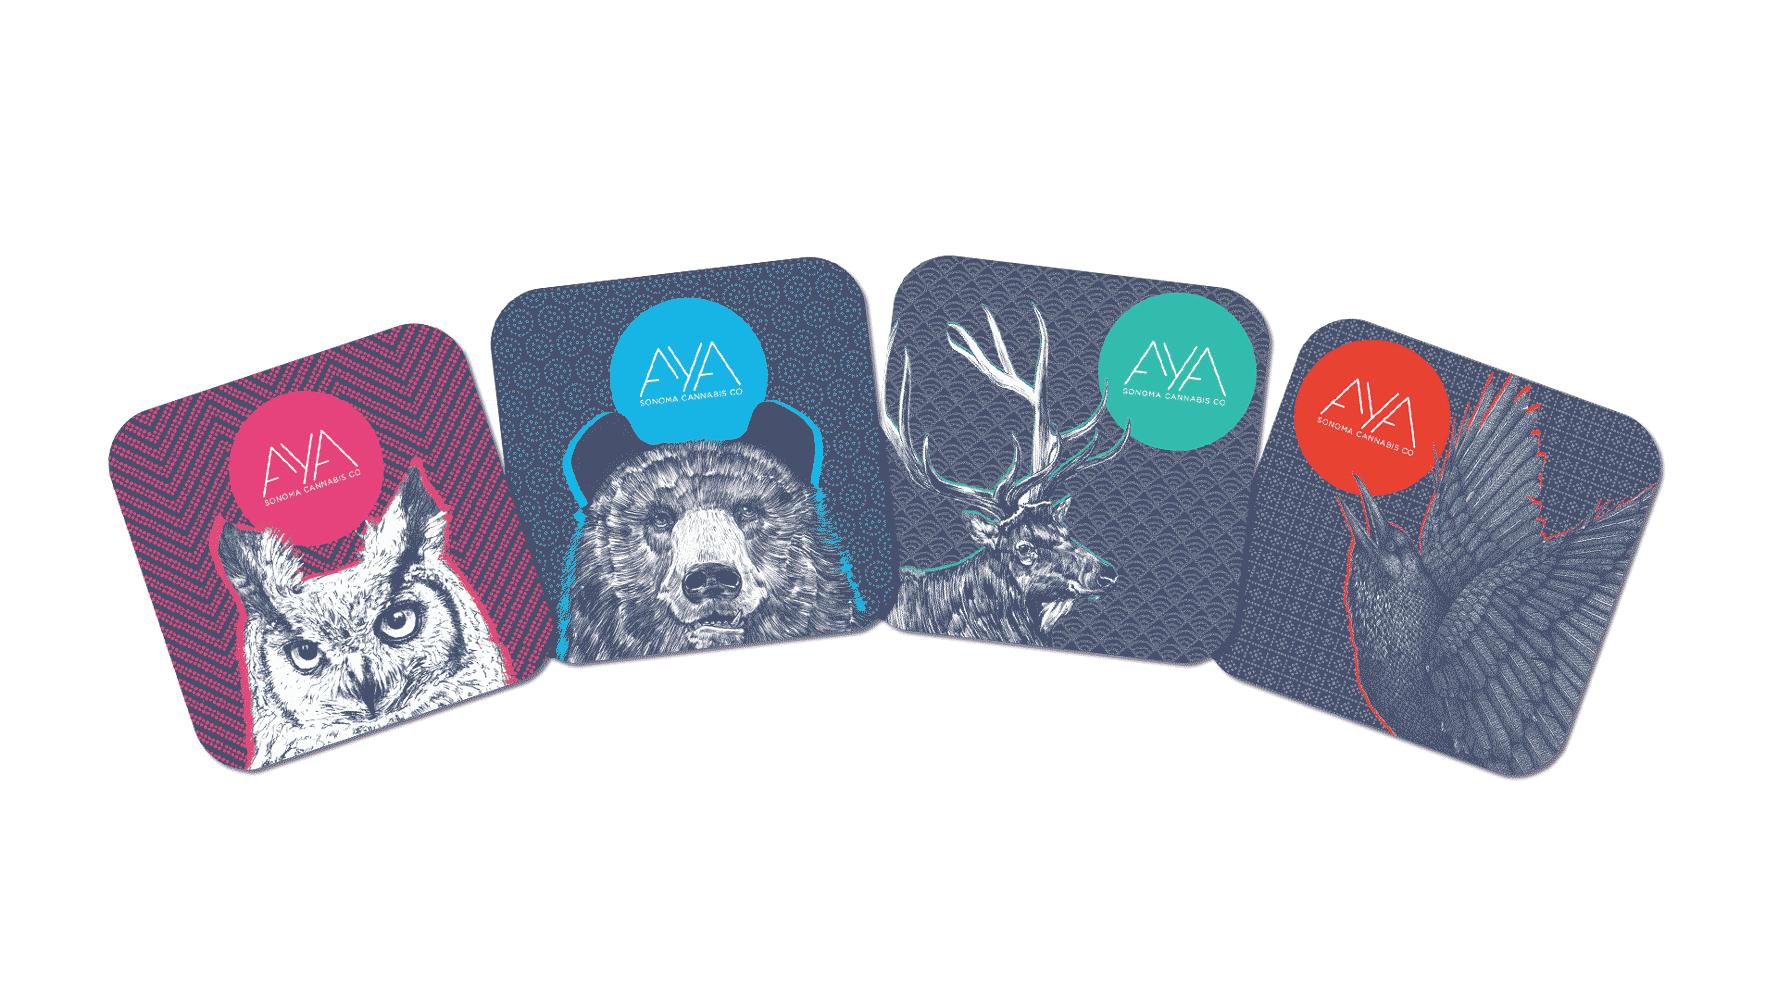 Aya-Stickers_Mockup_WEB.png